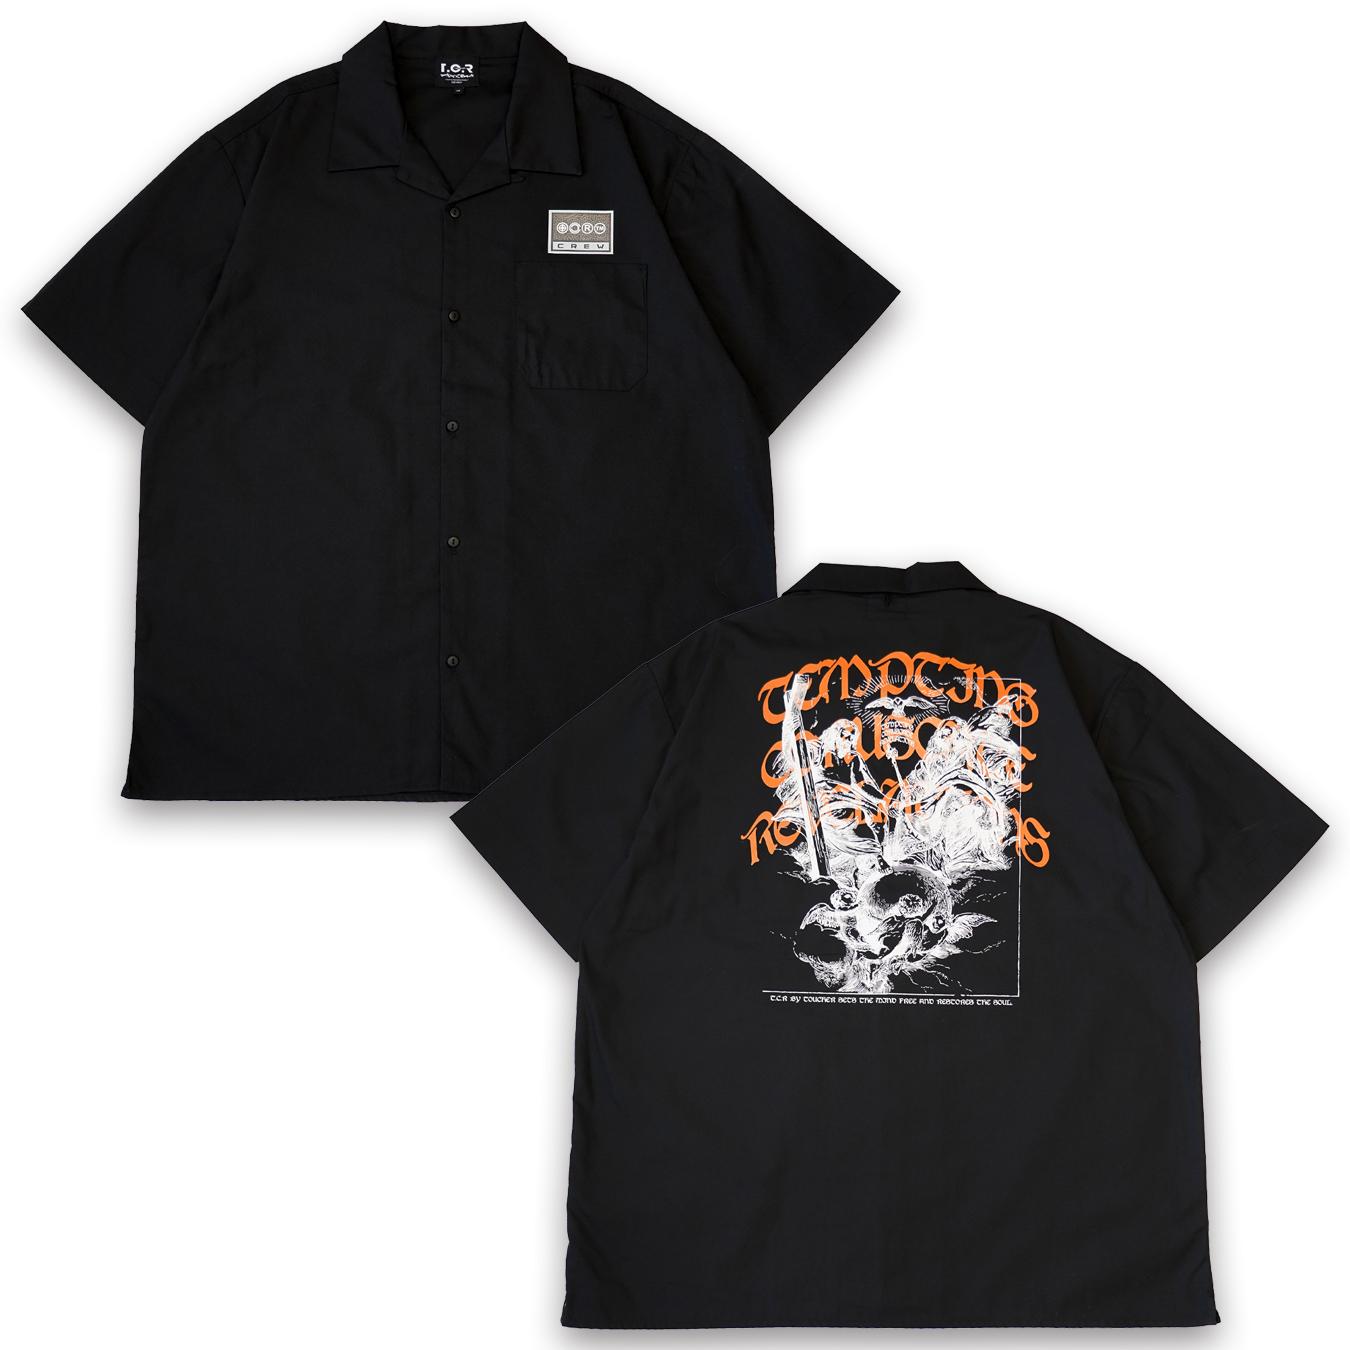 T.C.R GOD CREW BUFFALO S/S SHIRTS  - exclusive -  BLACK